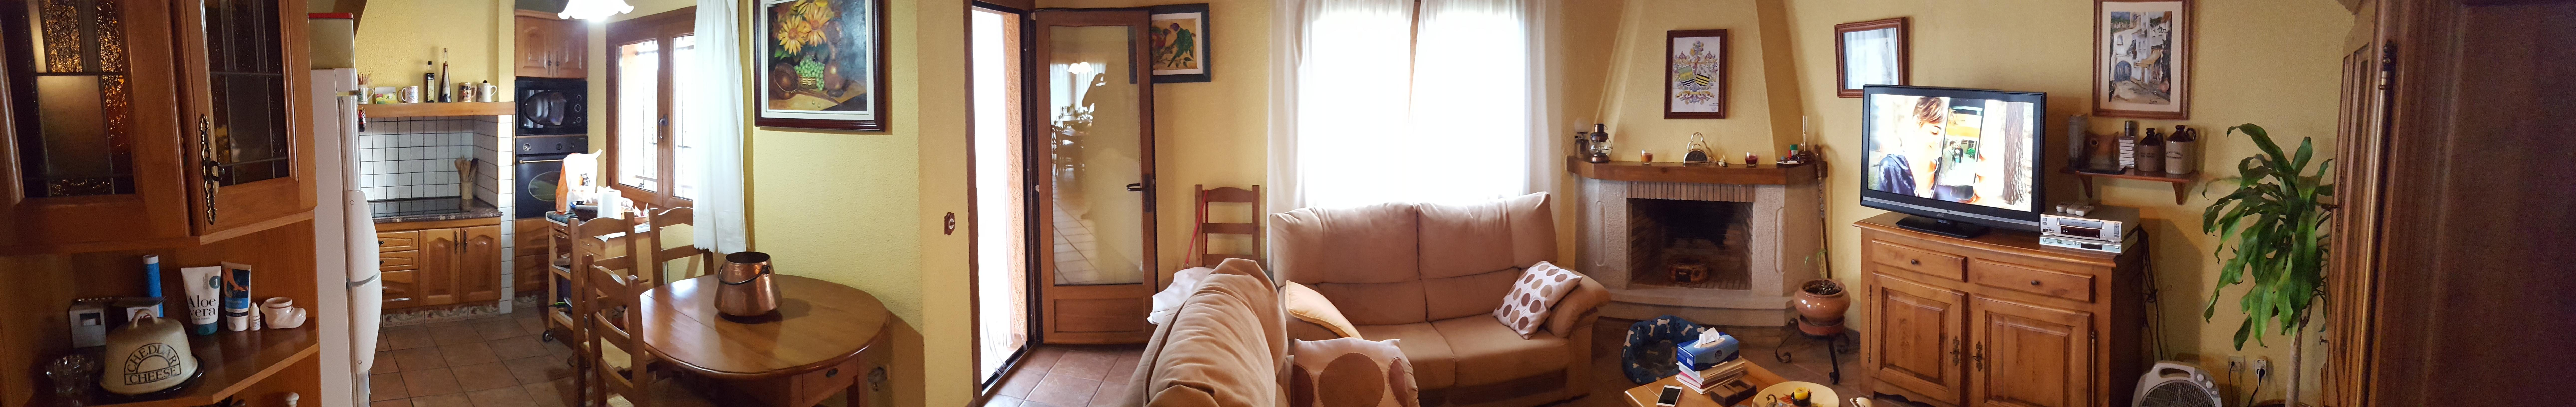 Venta de casa en Platja d´Aro